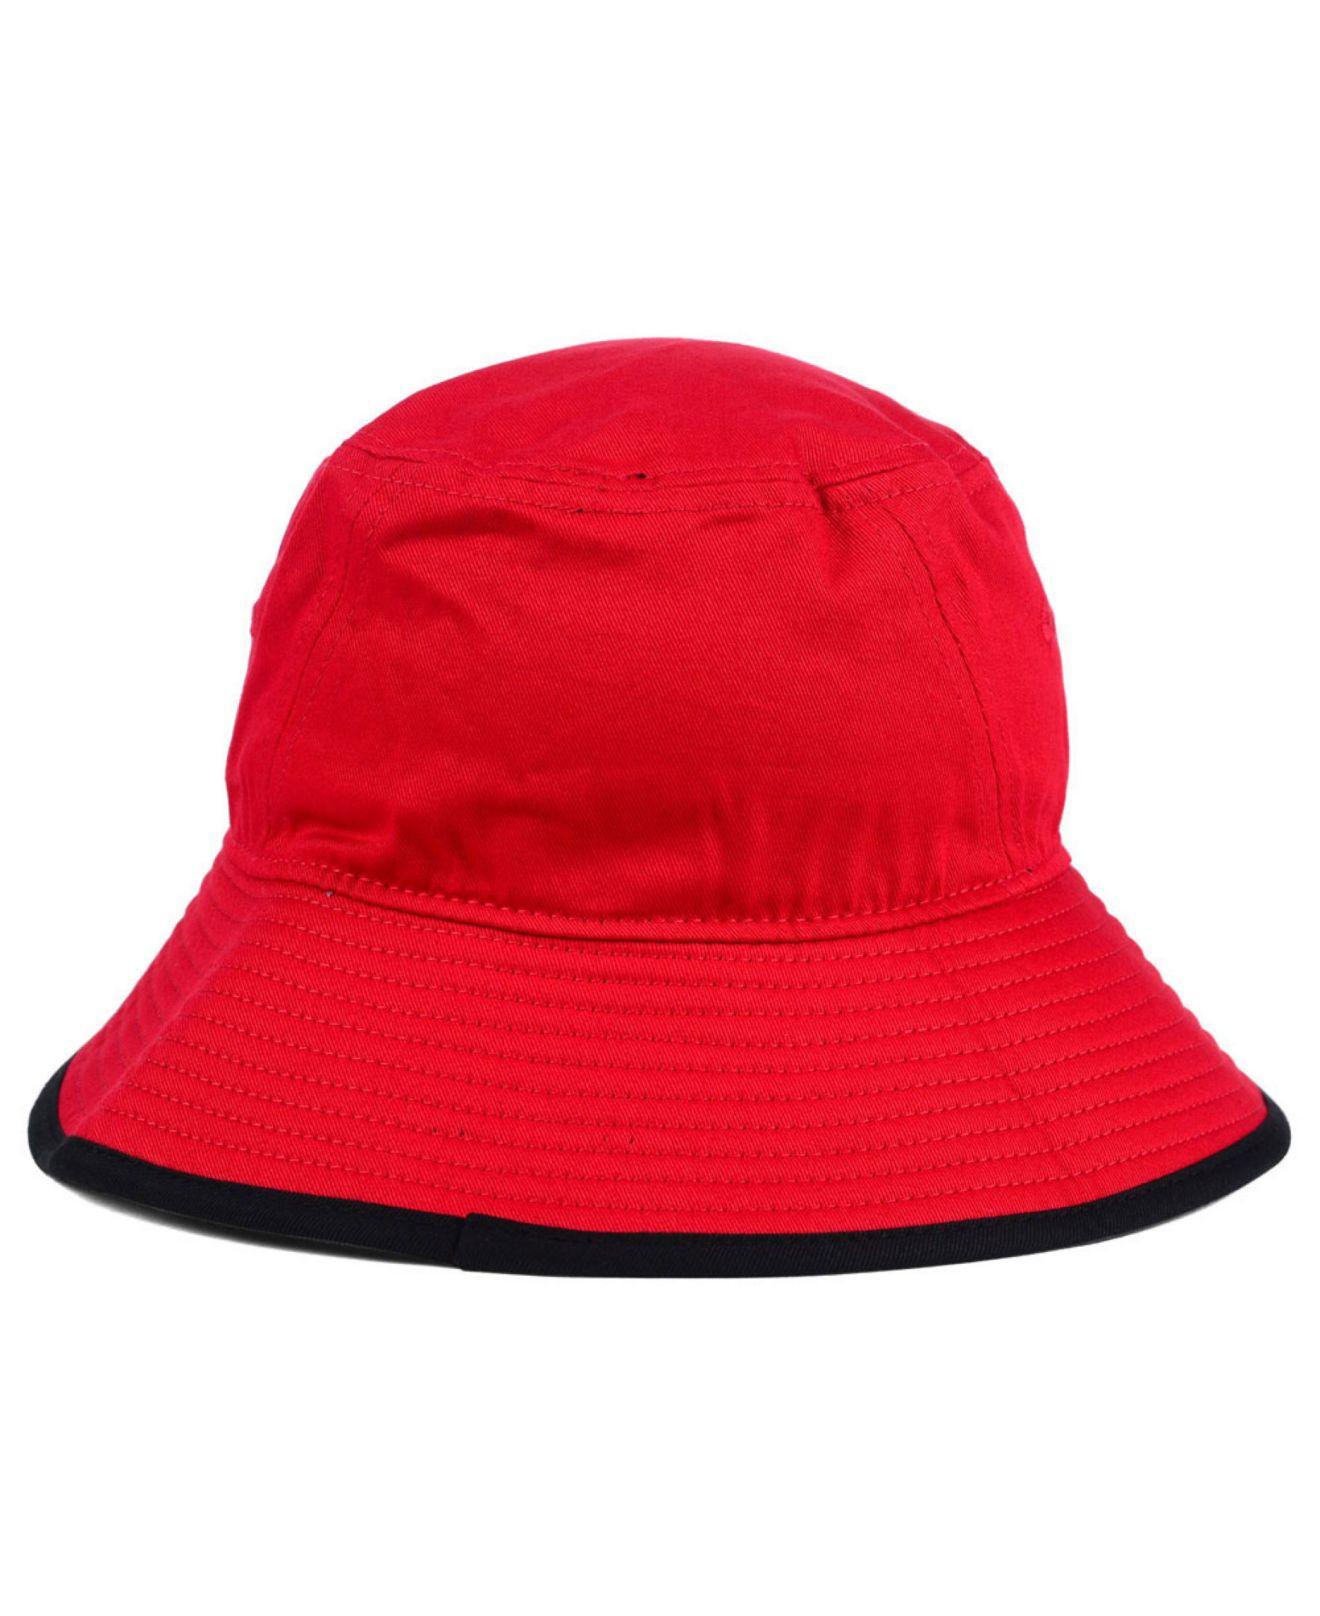 cff5ca1a4c8 ... australia lyst ktz texas tech red raiders tip bucket hat in red for men  9ae0d 75146